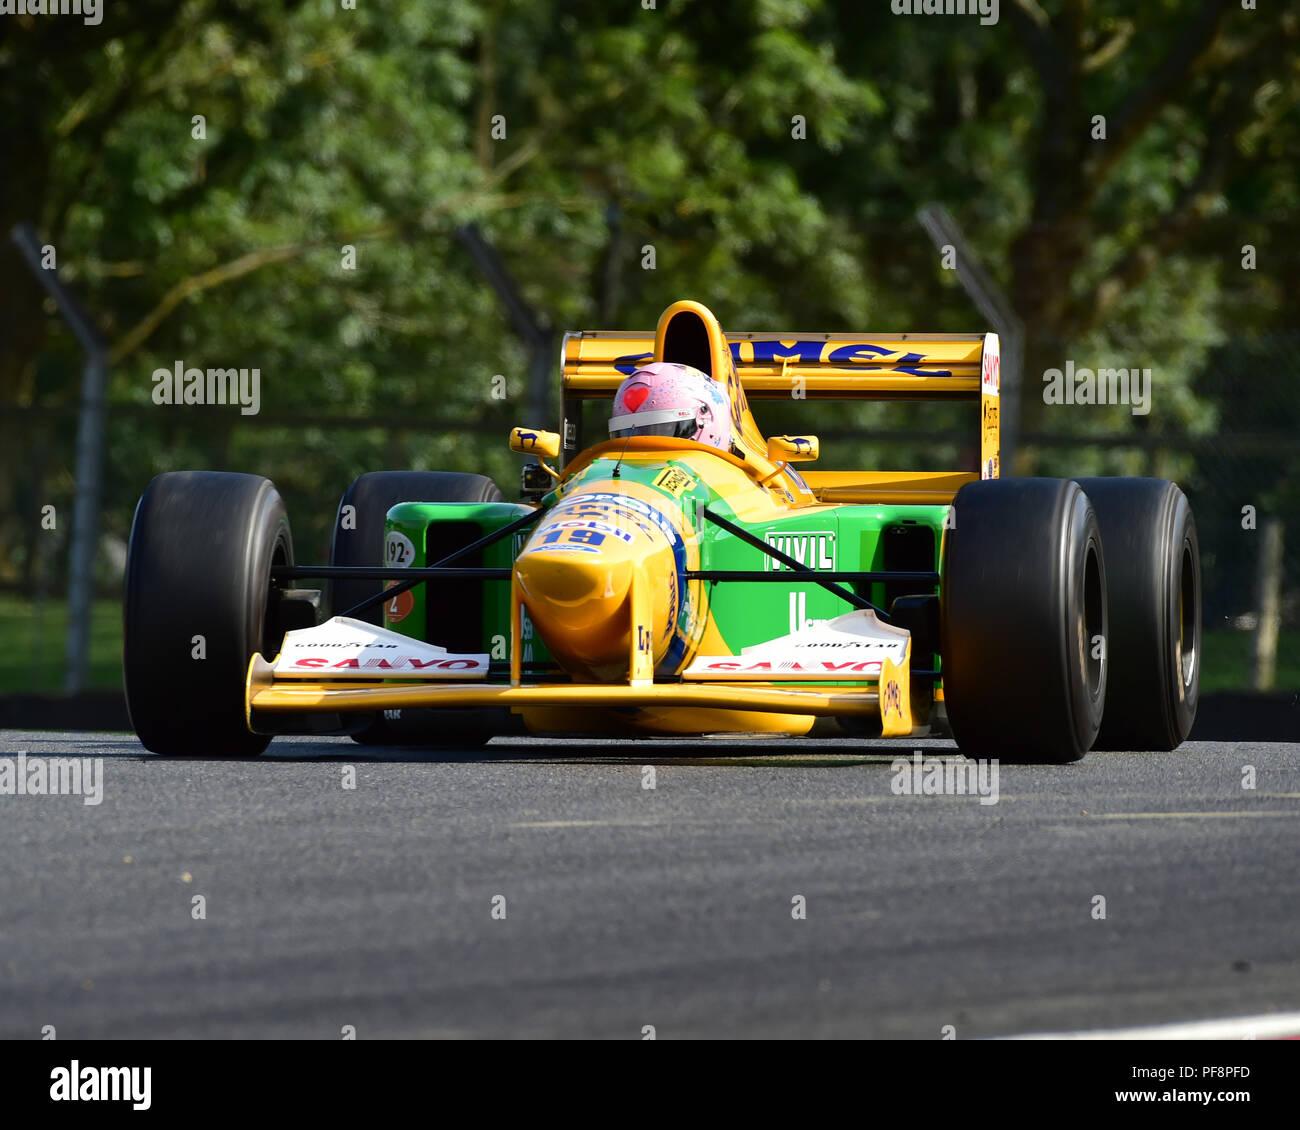 Lorina McLaughlin, Benetton B192, F1, Historic Racing Car Demonstration, Festival Italia, Brands Hatch, Kent, August 19th, 2018, circuit racing, compe - Stock Image